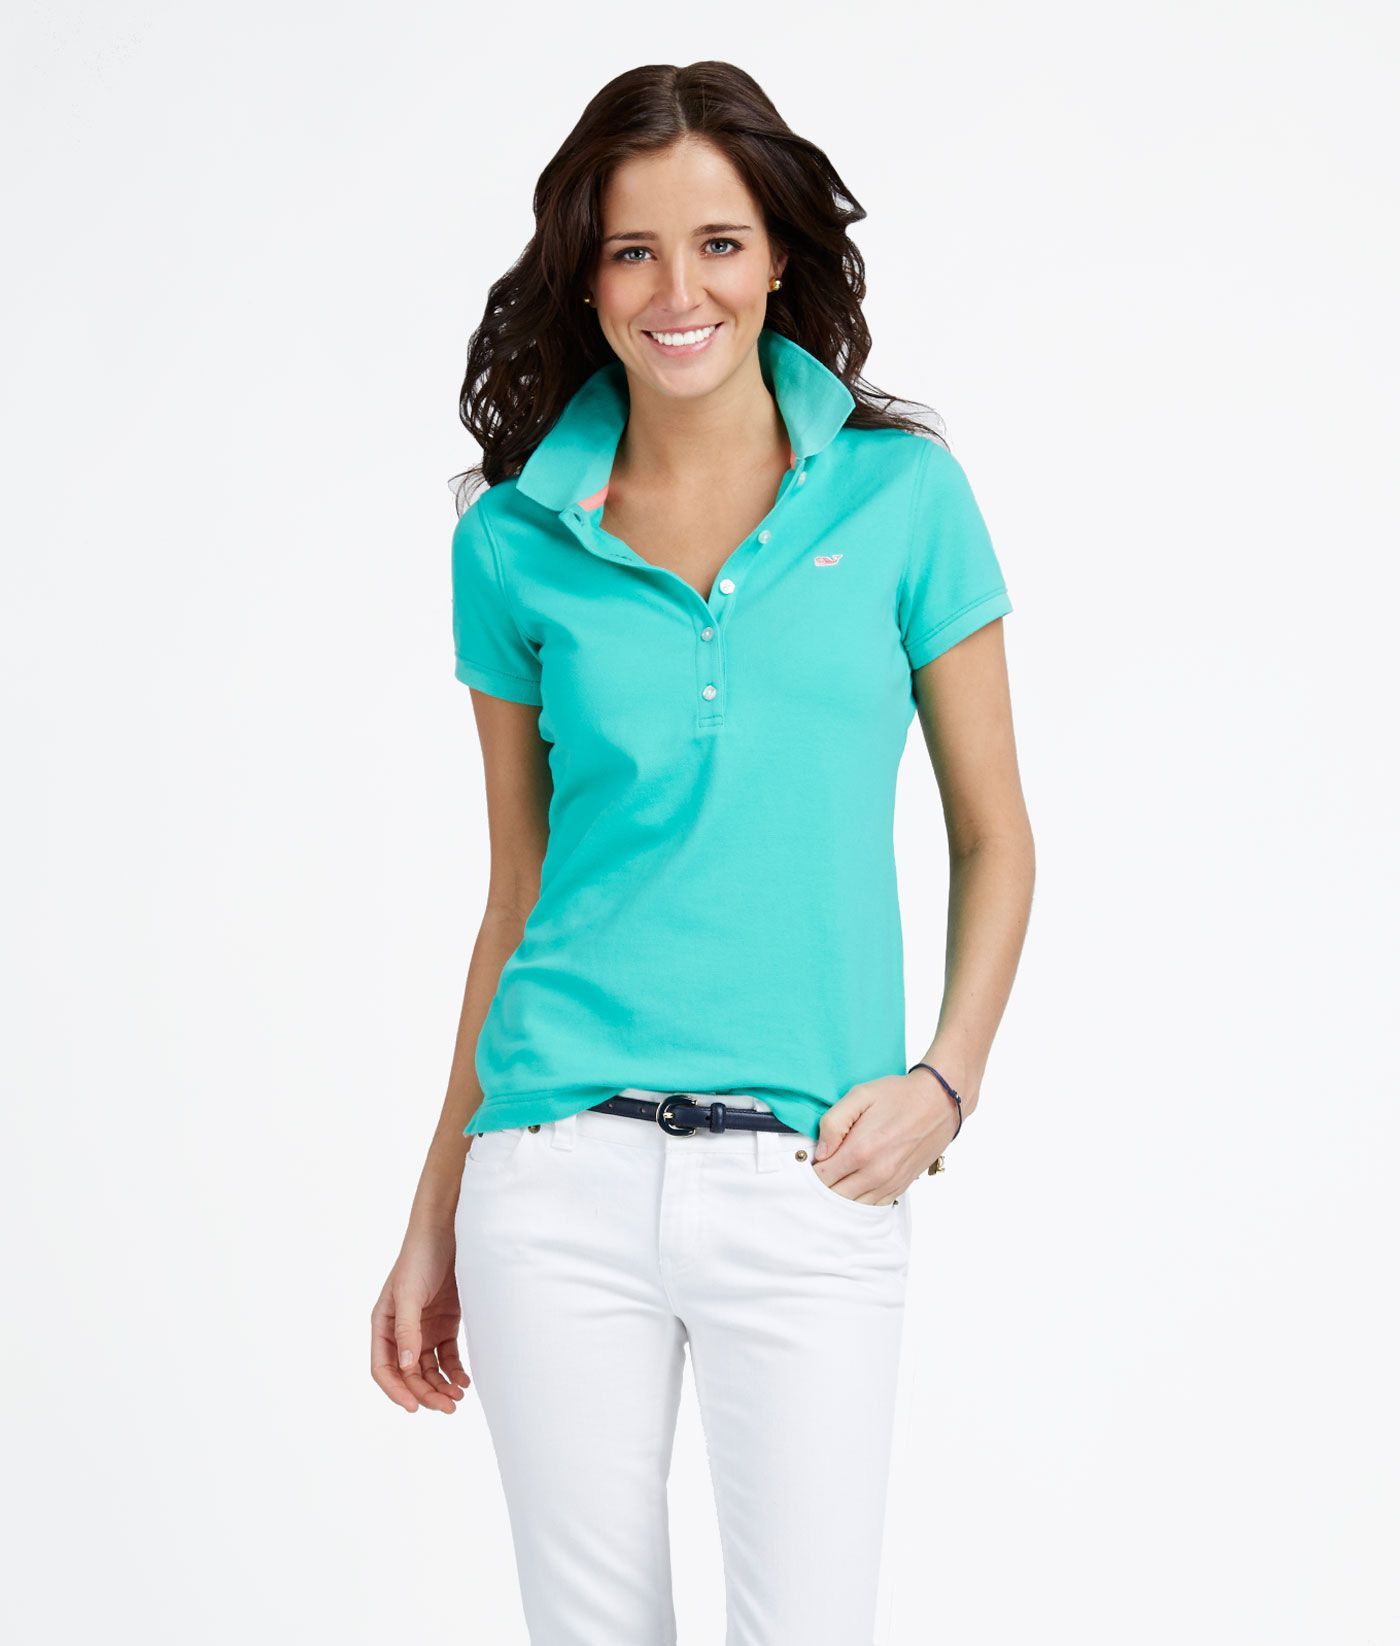 d829a9252a Women s Polo Shirts  Shoreline Short-Sleeve Polo for Women - Vineyard Vines